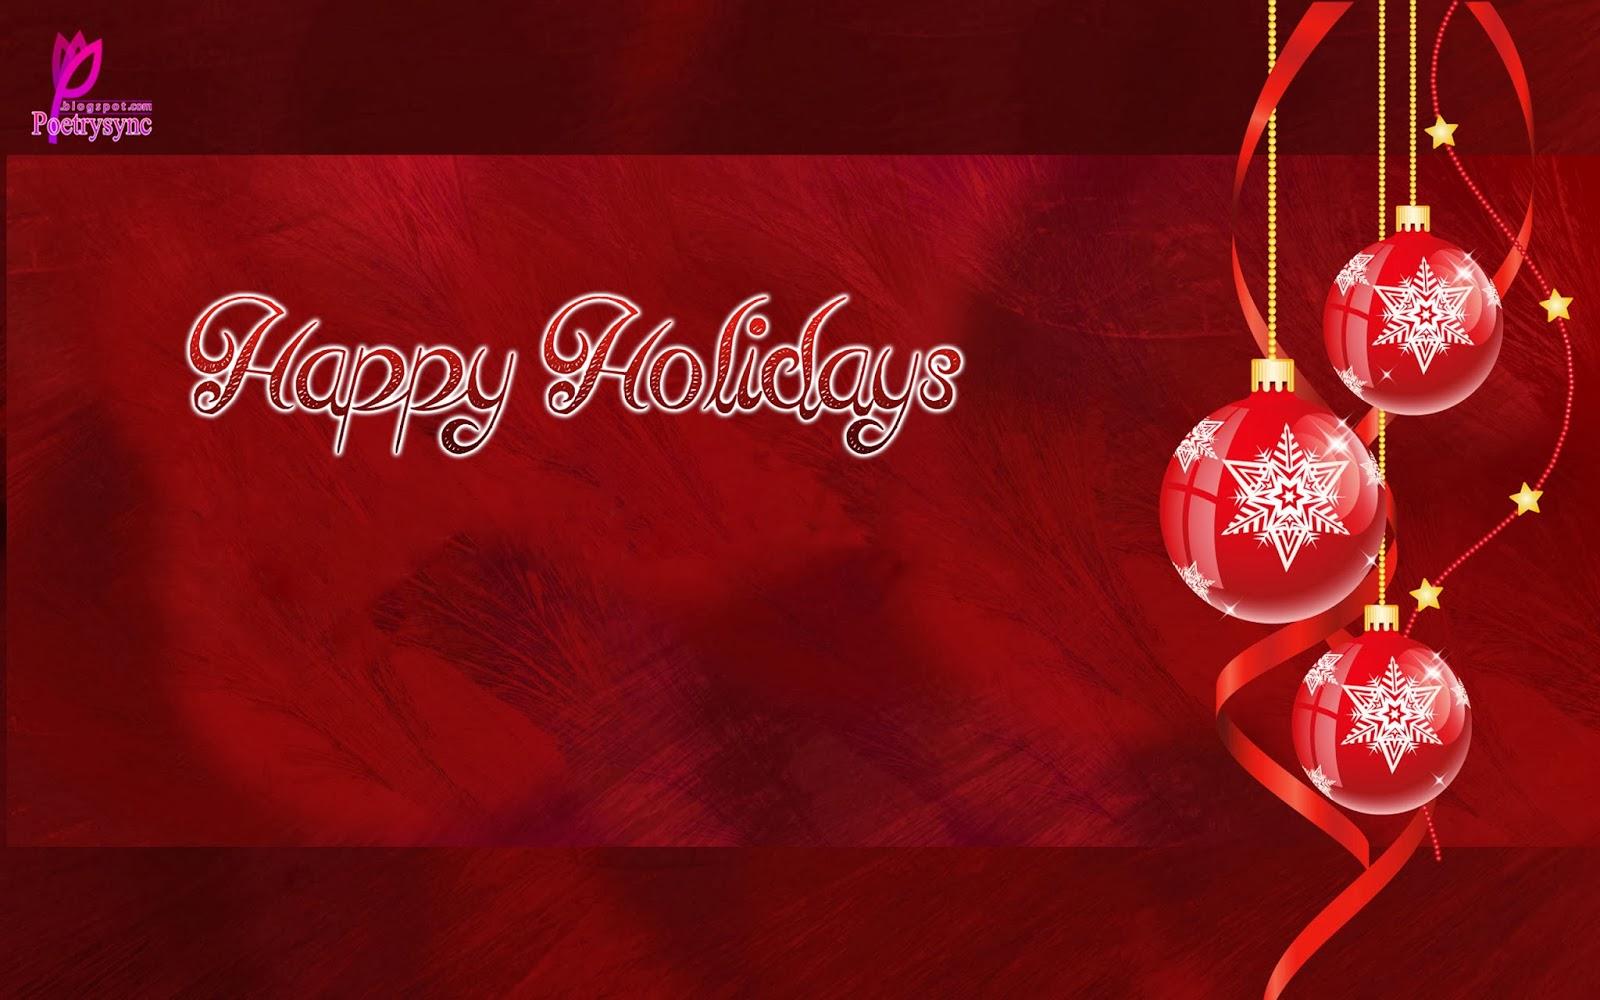 Holiday Season Quotes Inspirational Quotesgram: Season Greetings Quotes And Sayings. QuotesGram